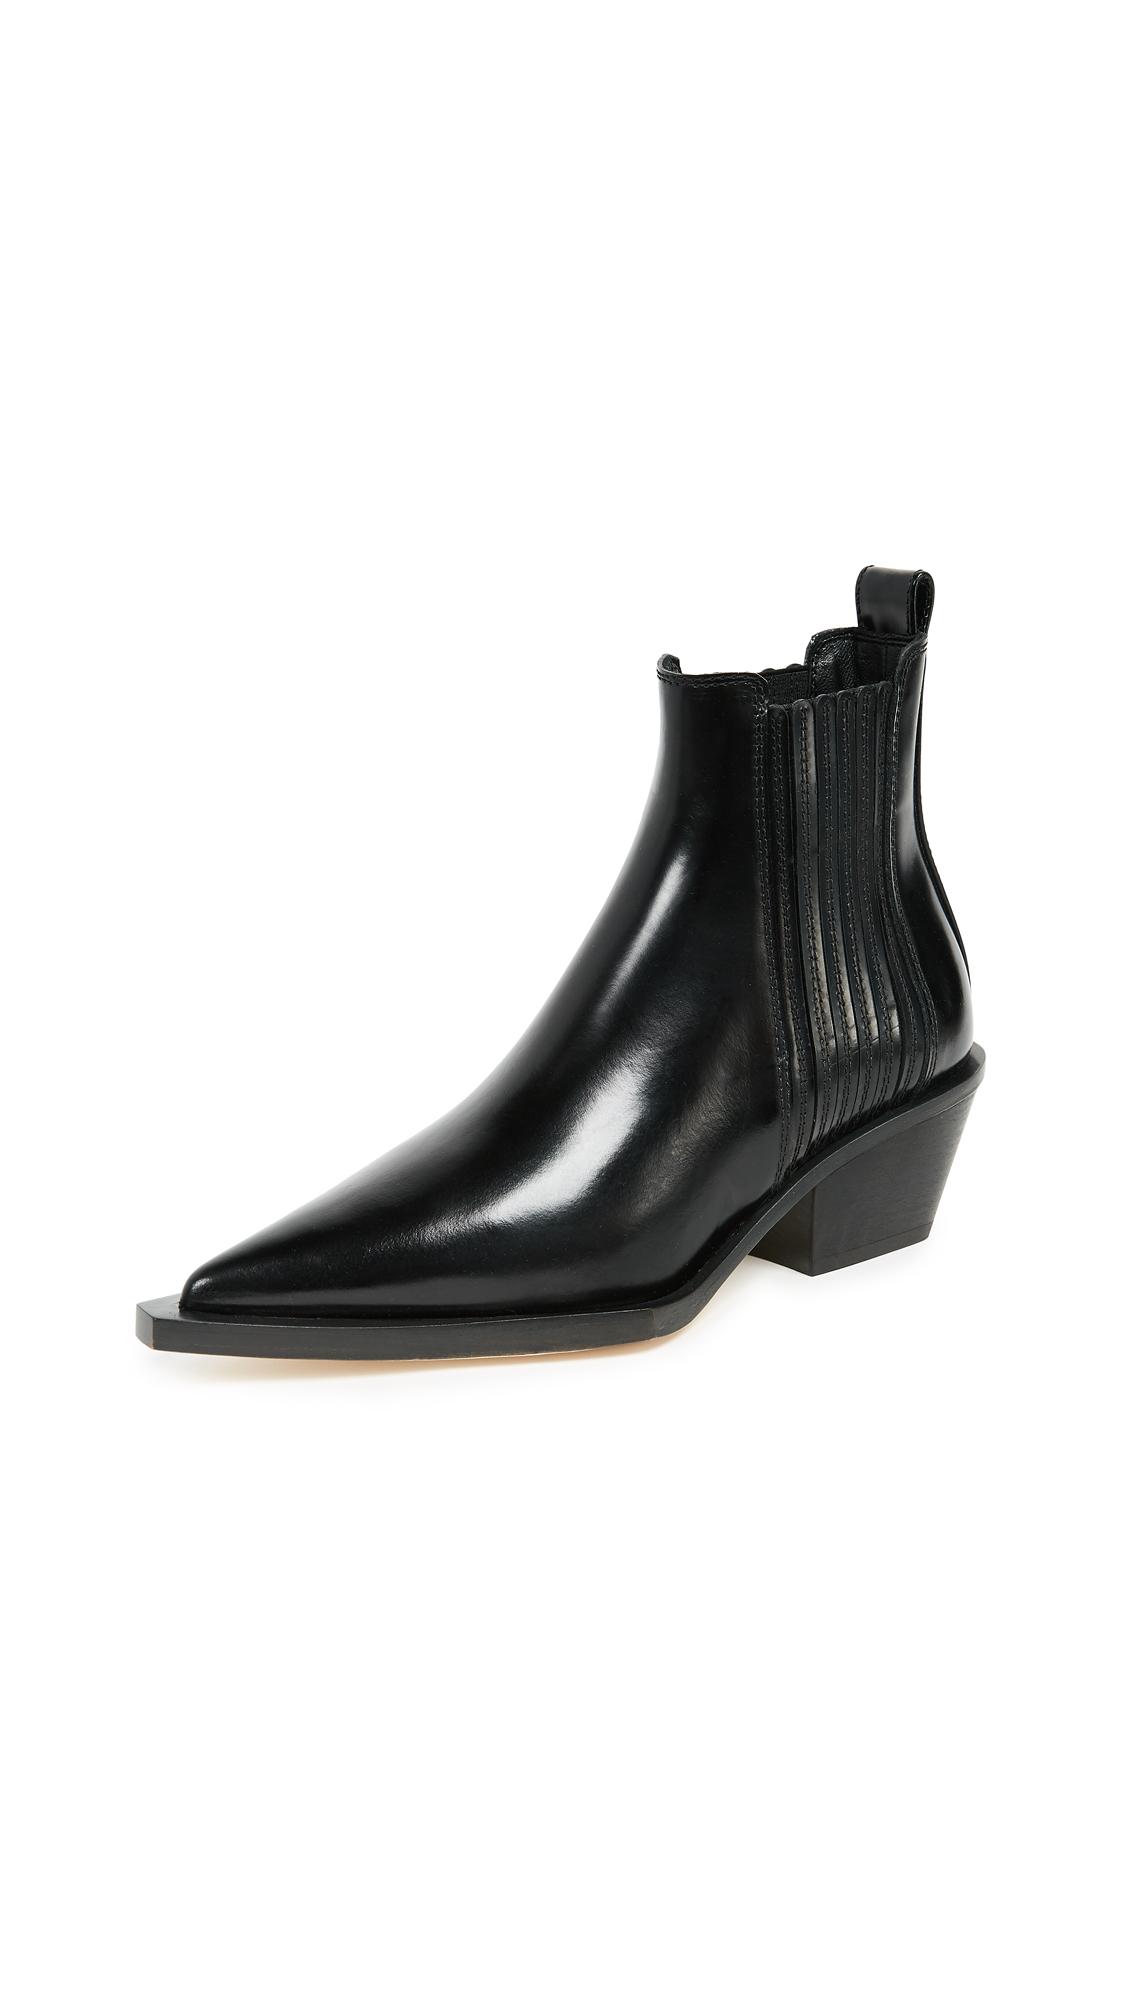 Helmut Lang Cowboy Boots - Black